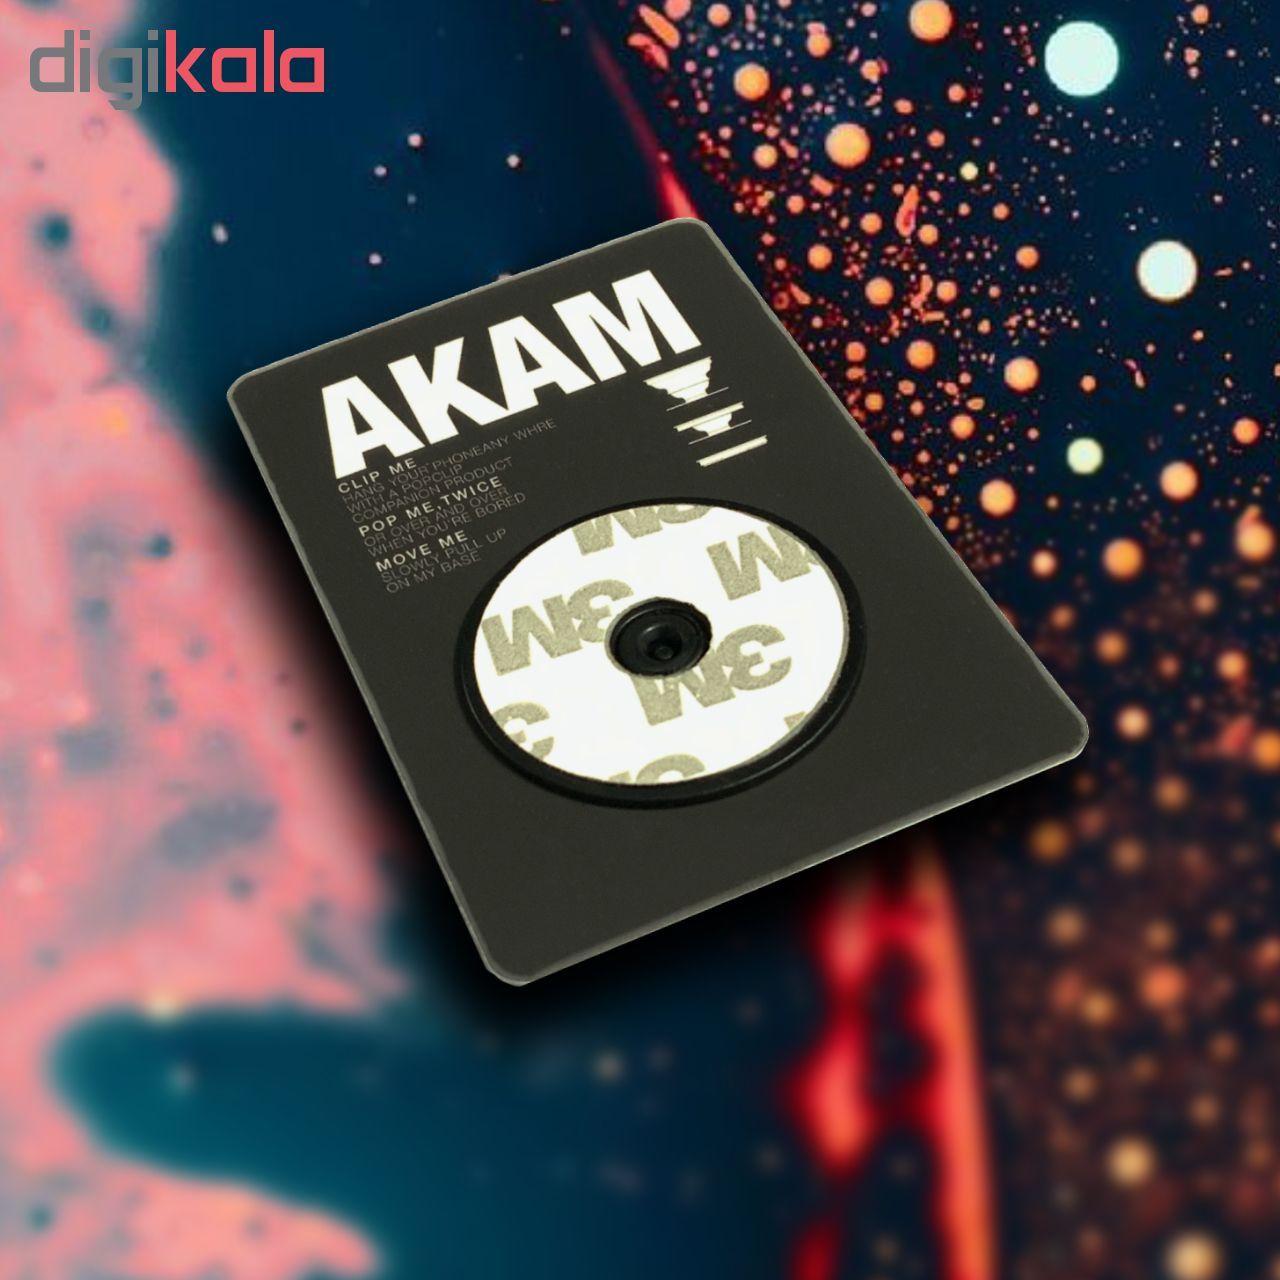 پایه نگهدارنده گوشی موبایل پاپ سوکت آکام مدل APS0111 main 1 2